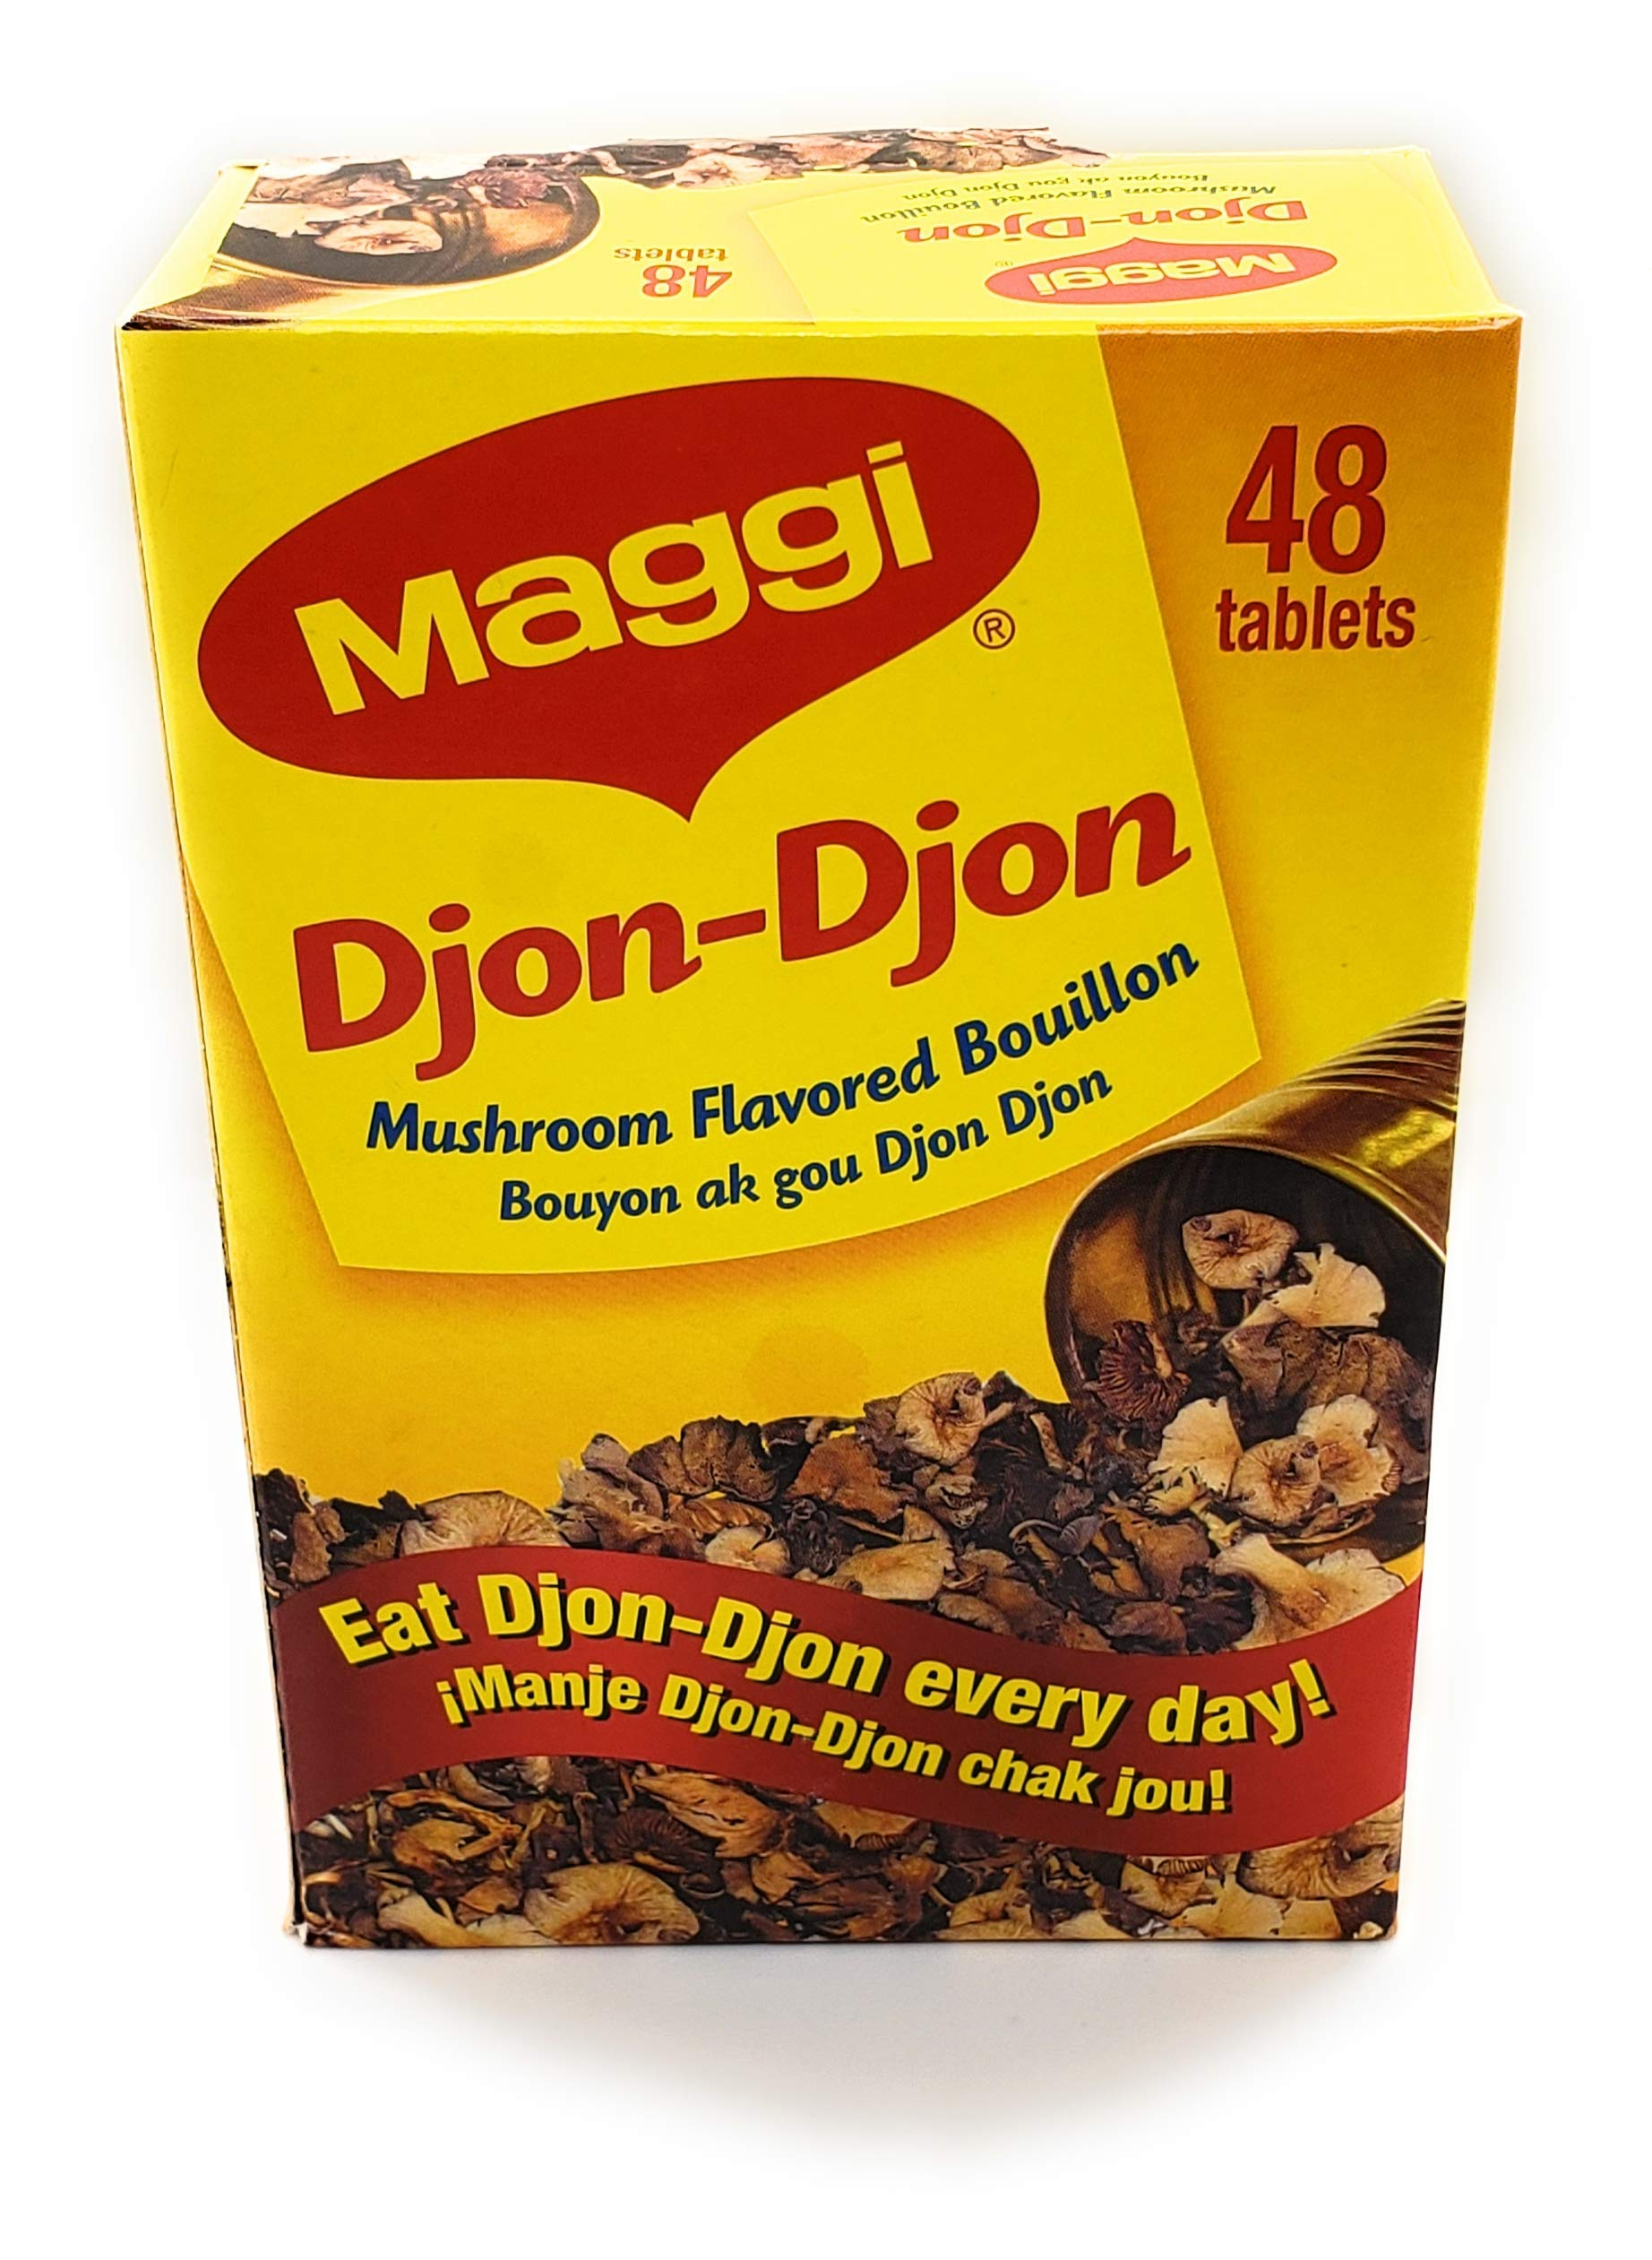 MAGGI Djon Djon bouillon cubes - mushoom flavored 1 box (48 cubes)